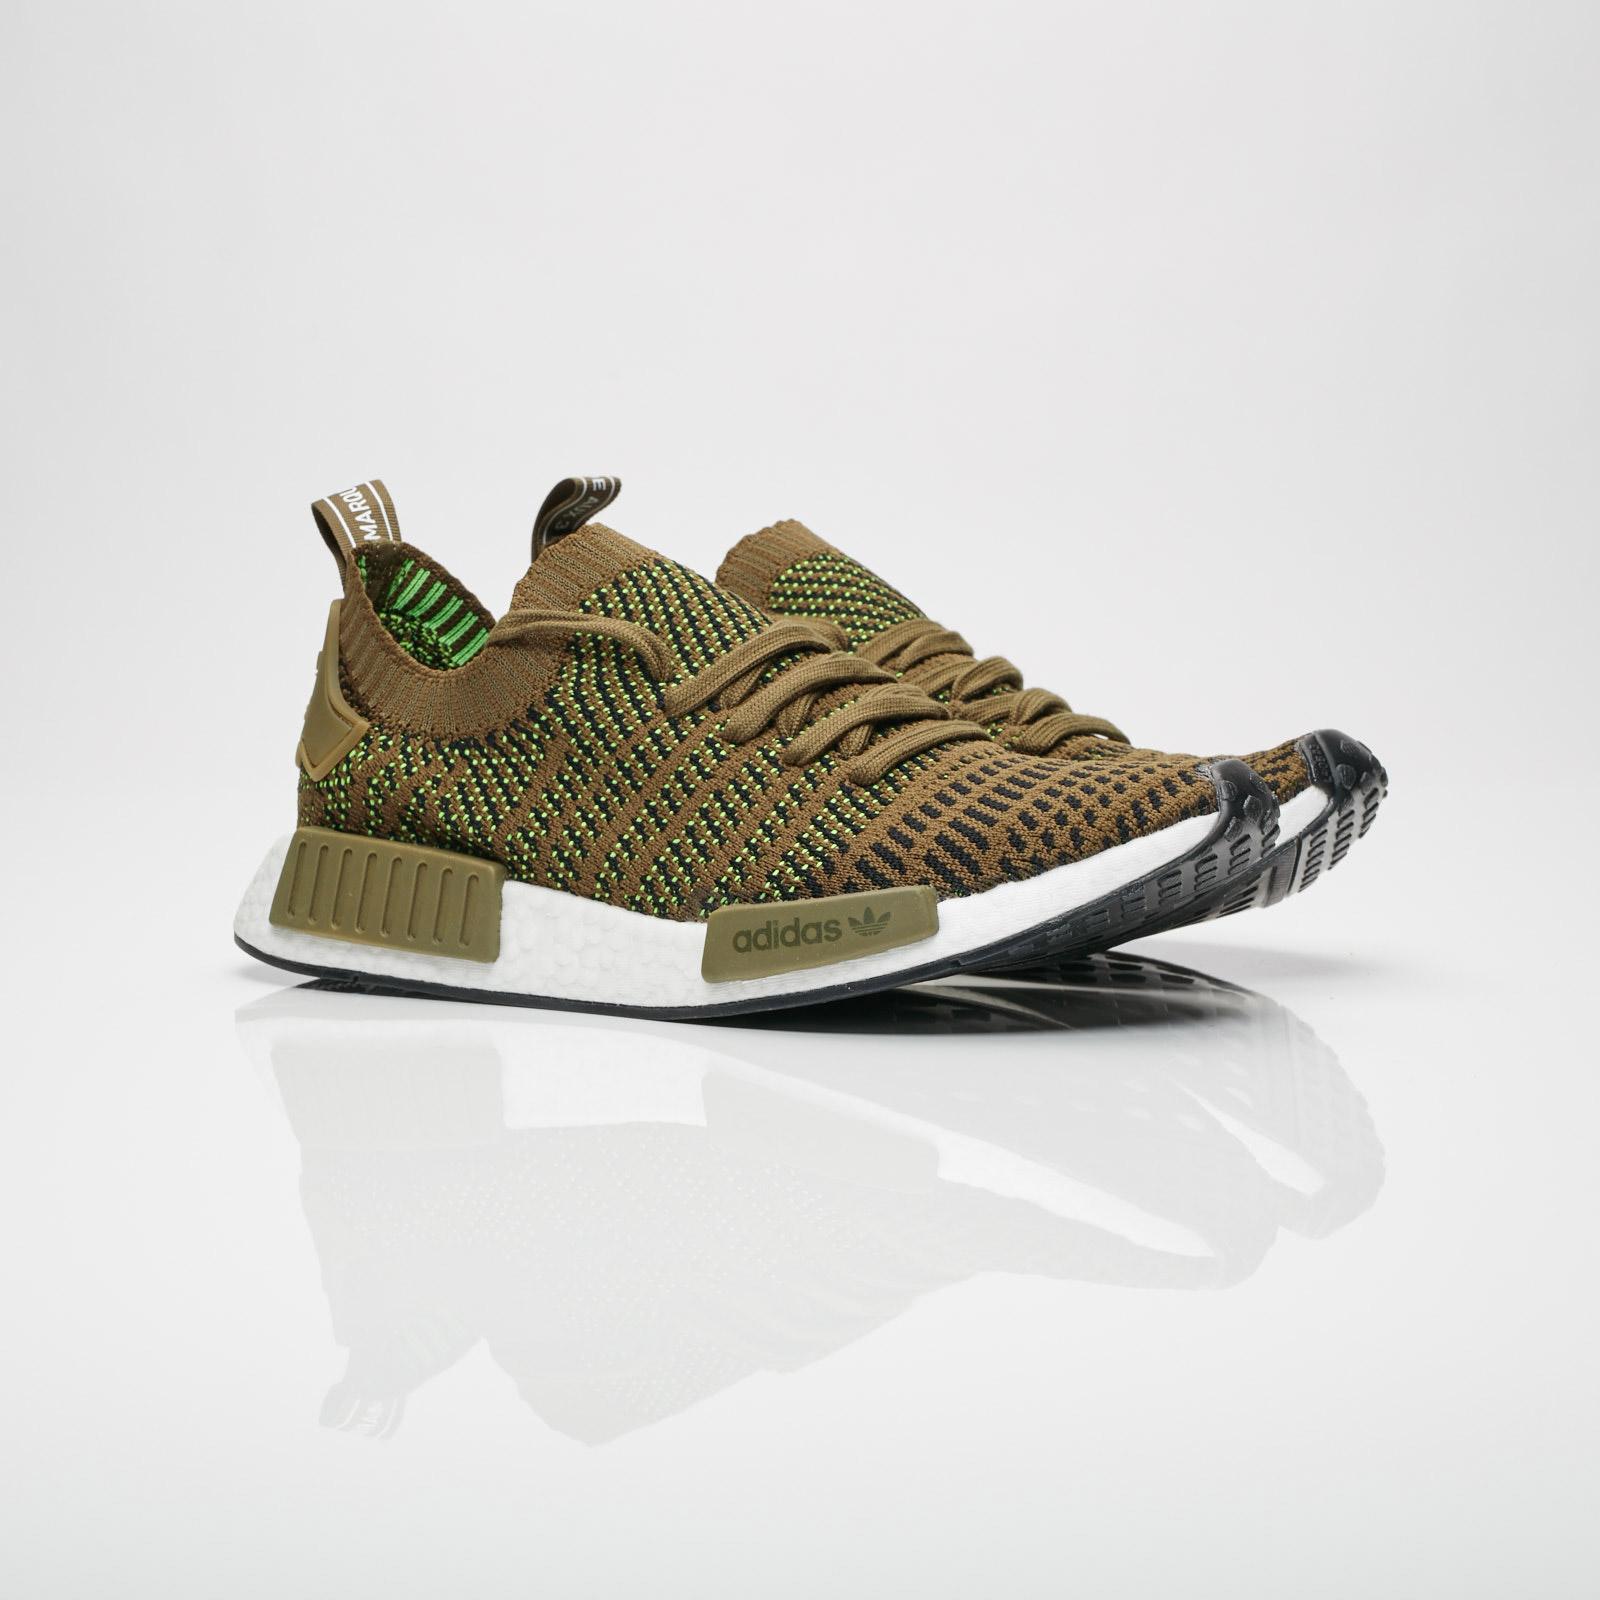 Adidas Nmd R1 Stlt Pk Cq2389 Sneakersnstuff Sneaker